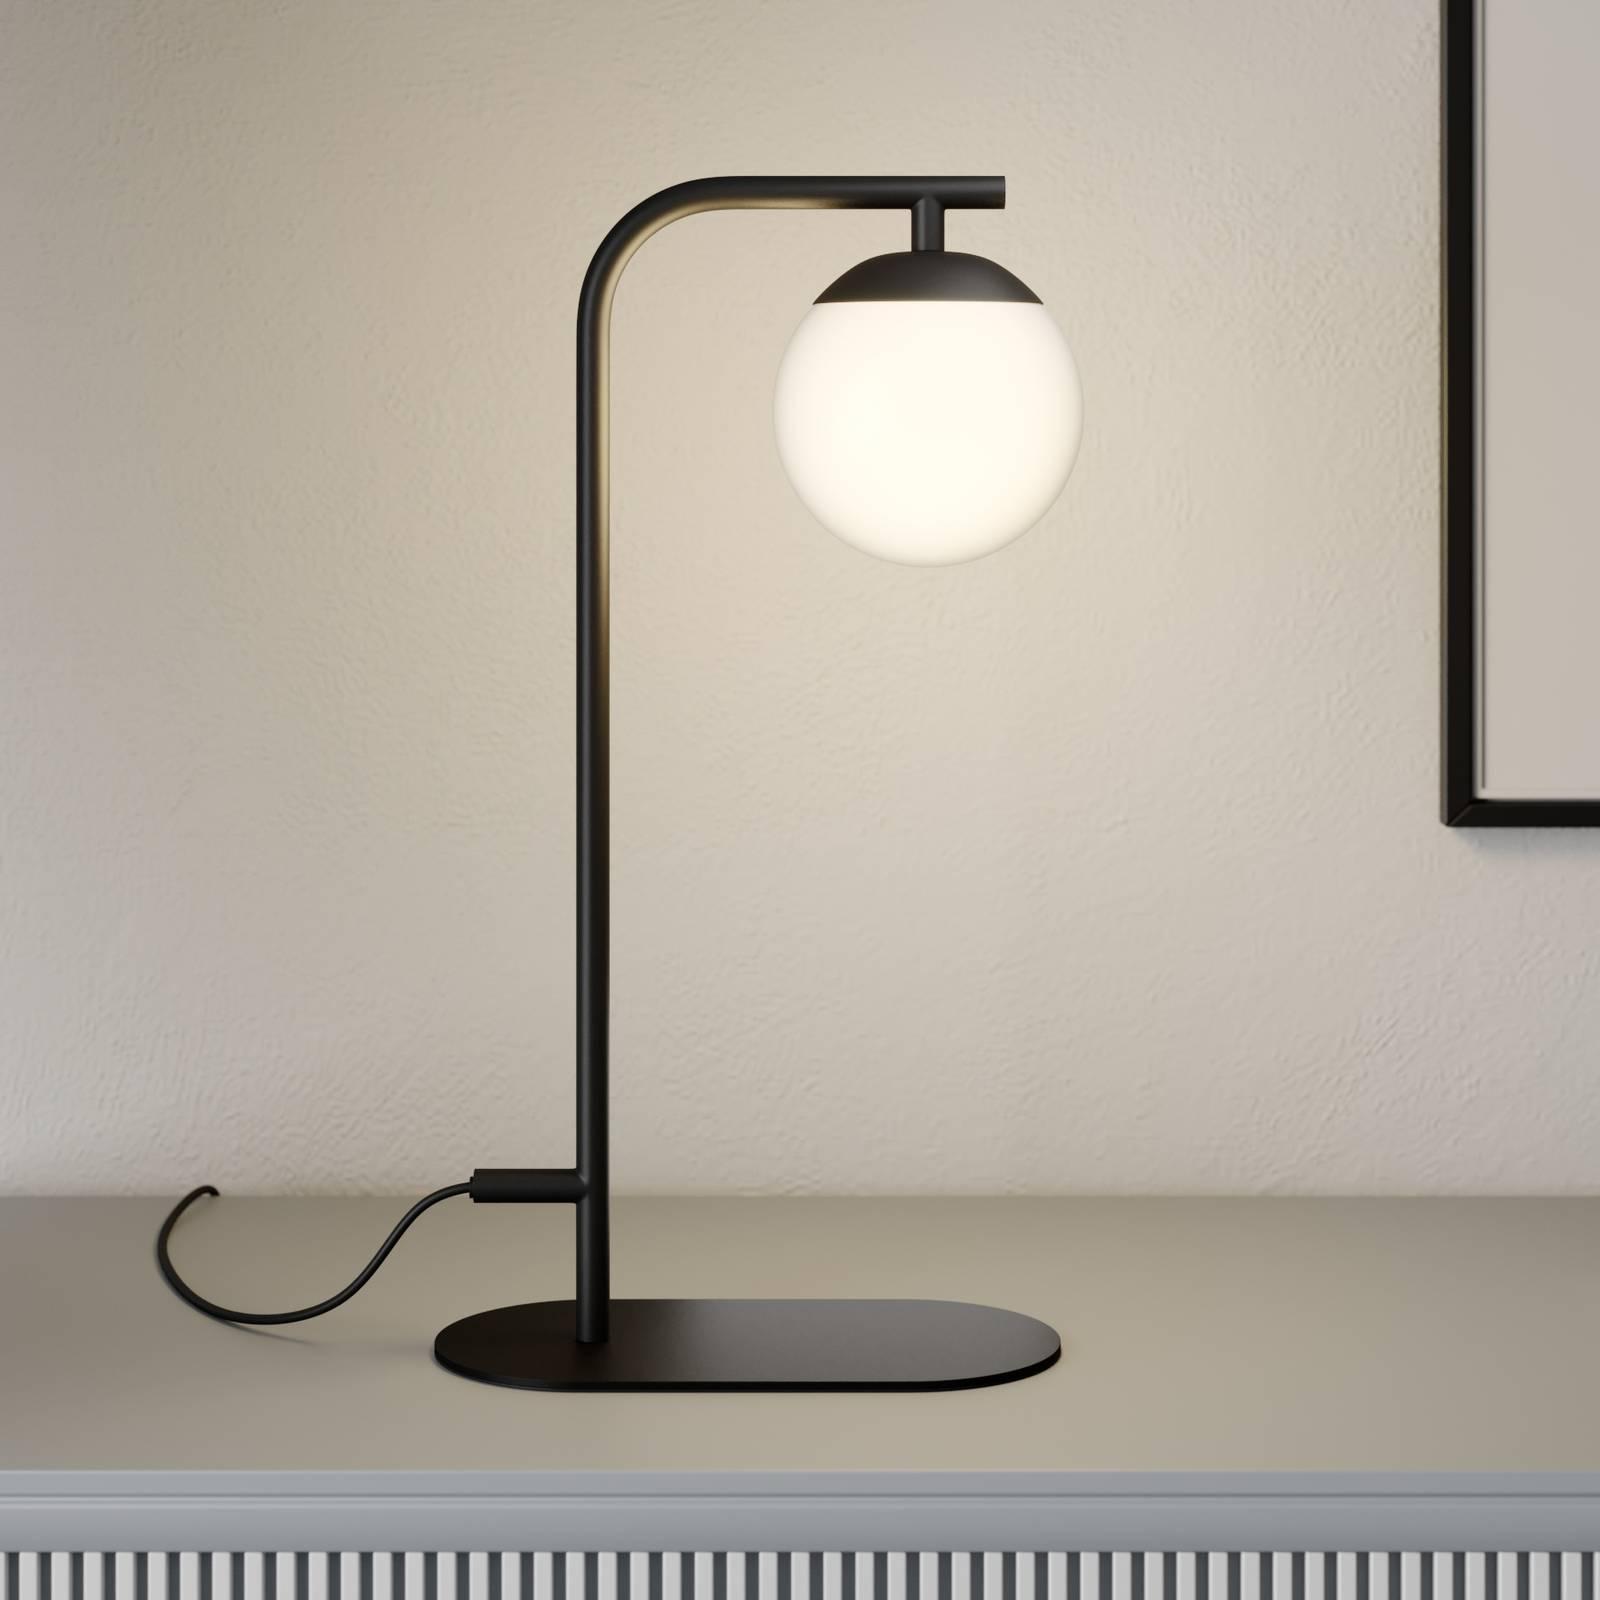 Lucande Rama lampada LED da tavolo con vetro